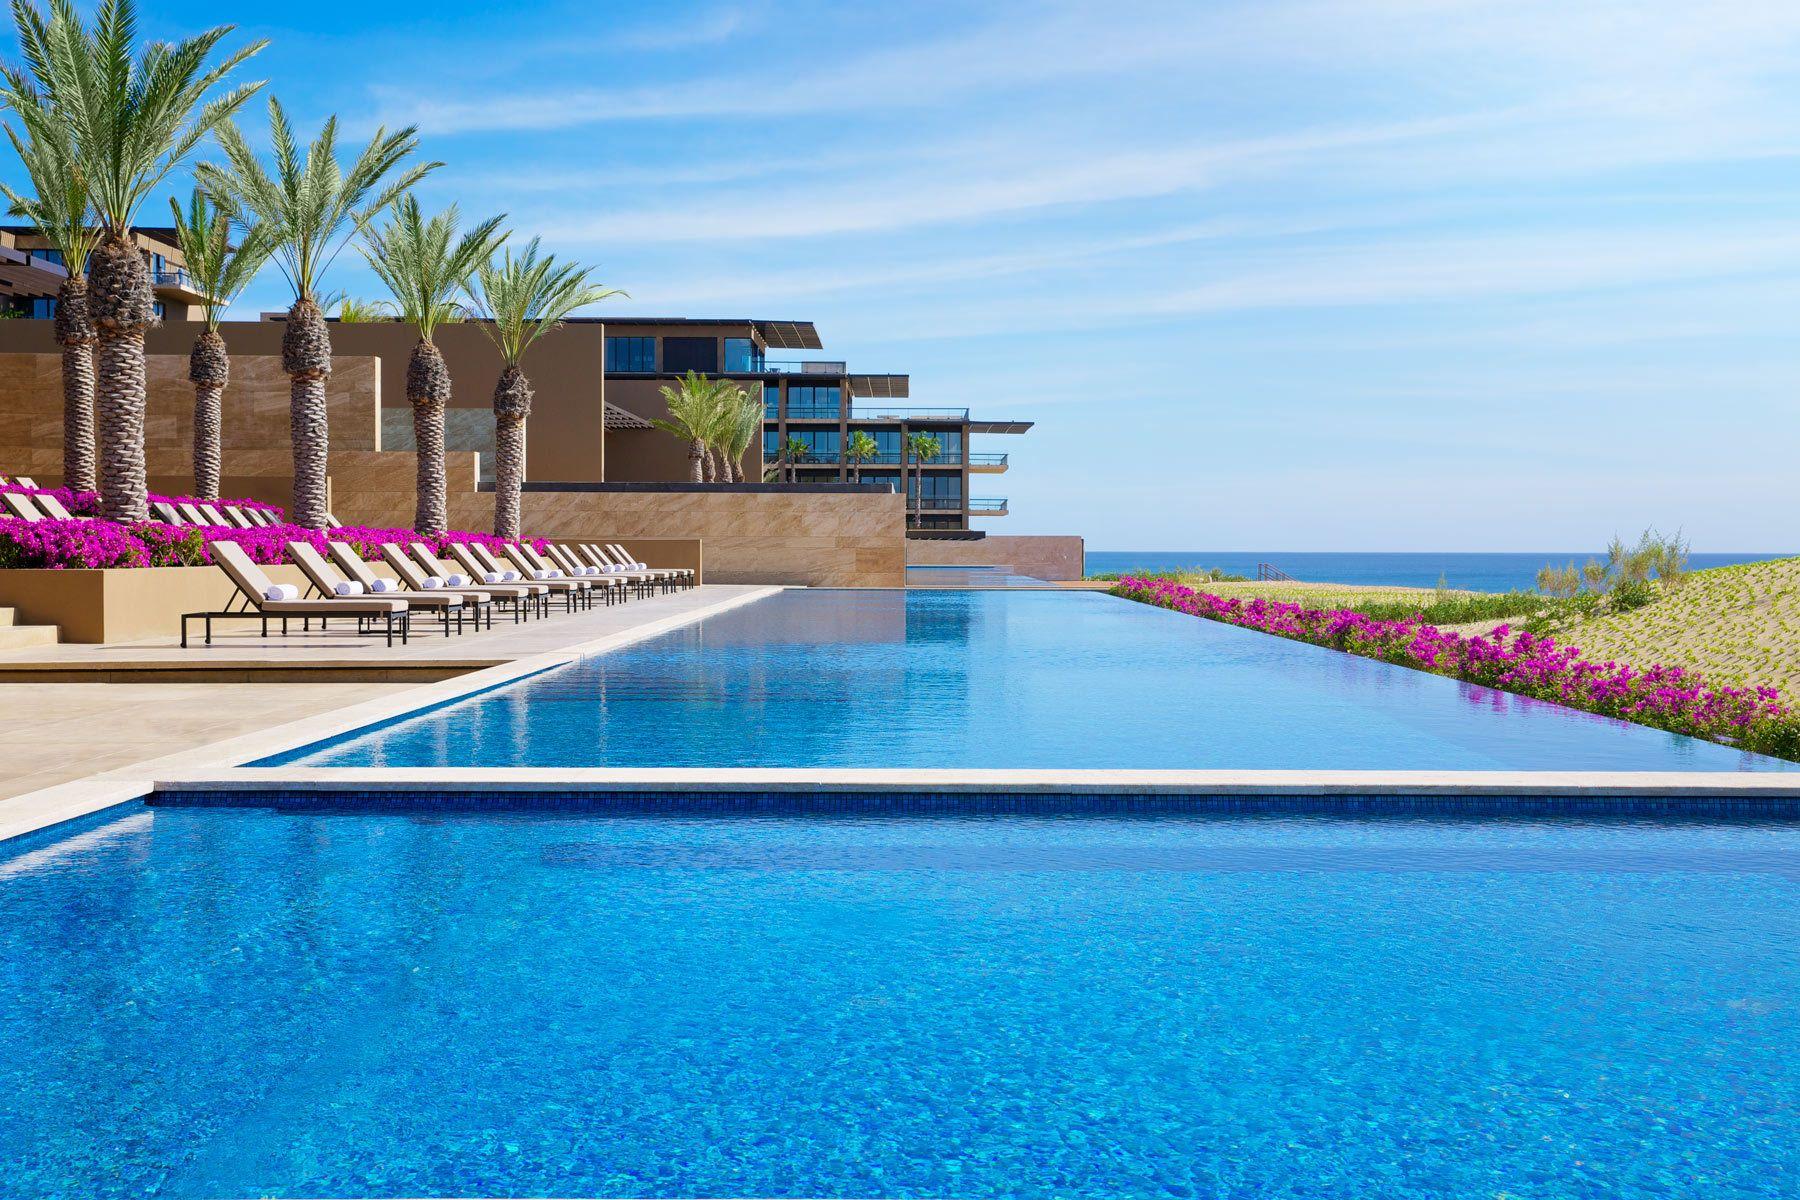 JW Marriott  Los Cabos wide view of pool